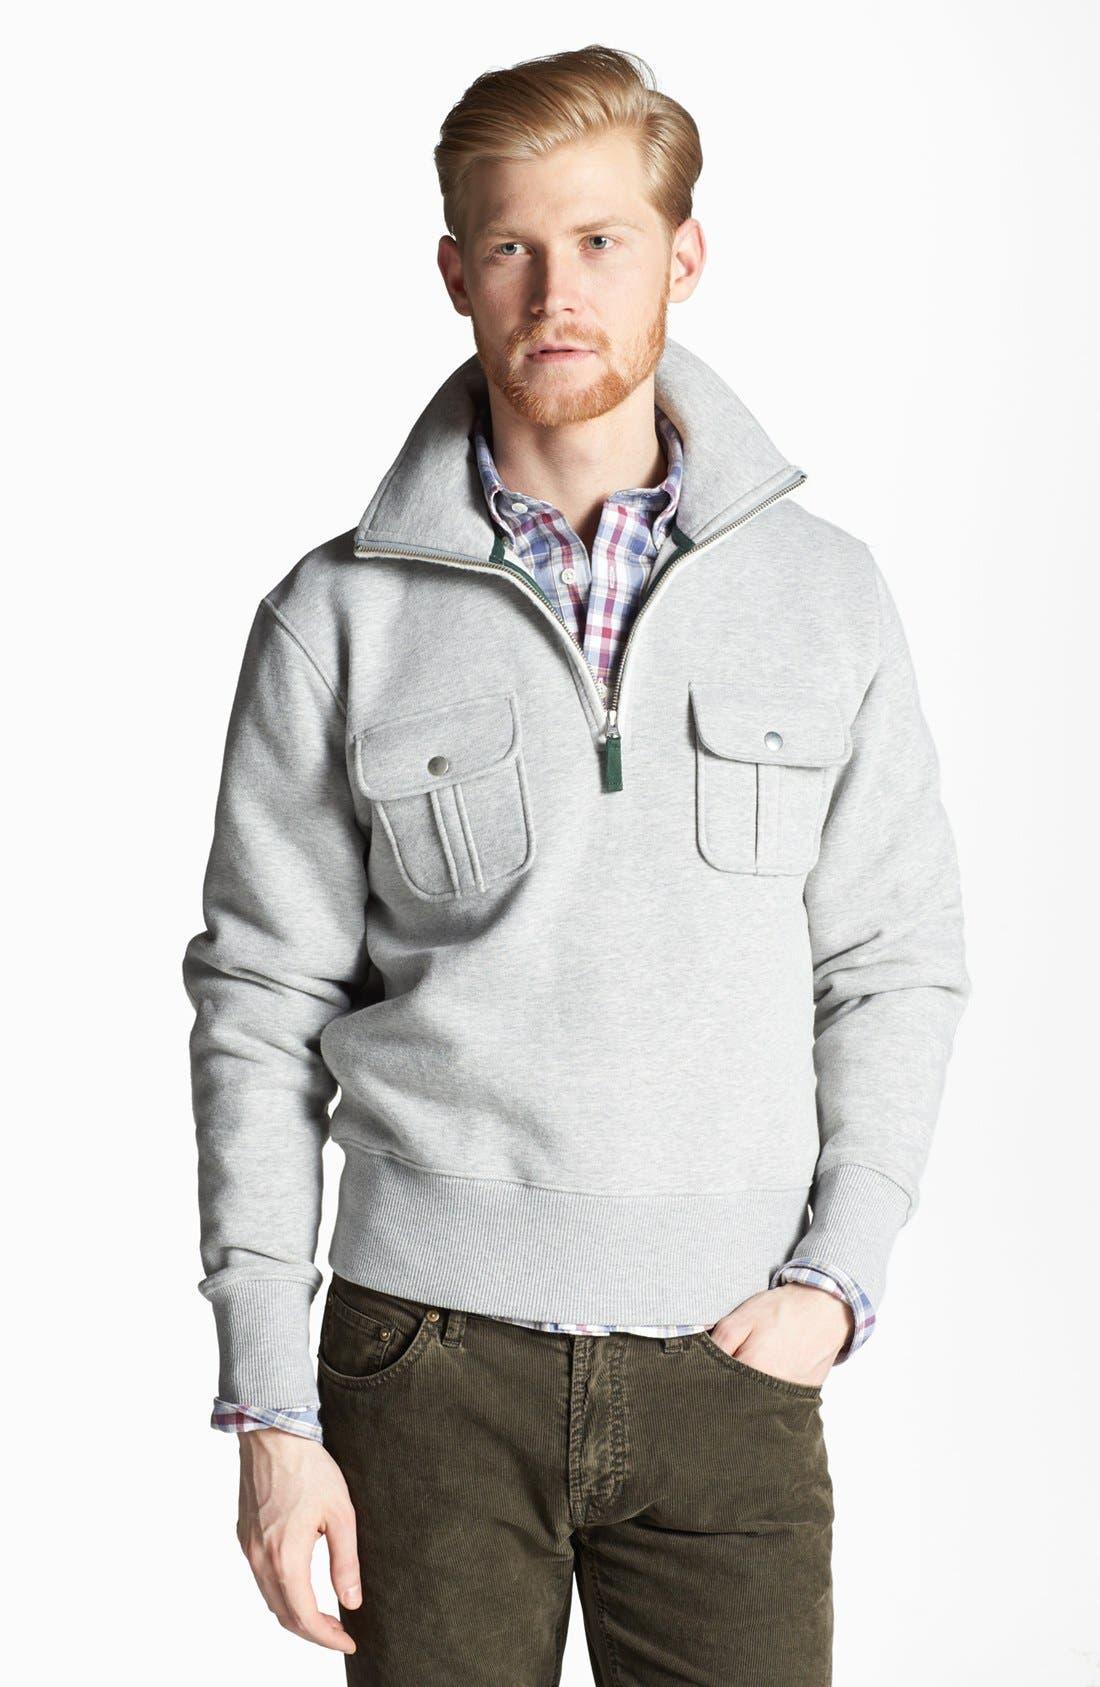 Main Image - Gant by Michael Bastian Half-Zip Pullover Sweatshirt